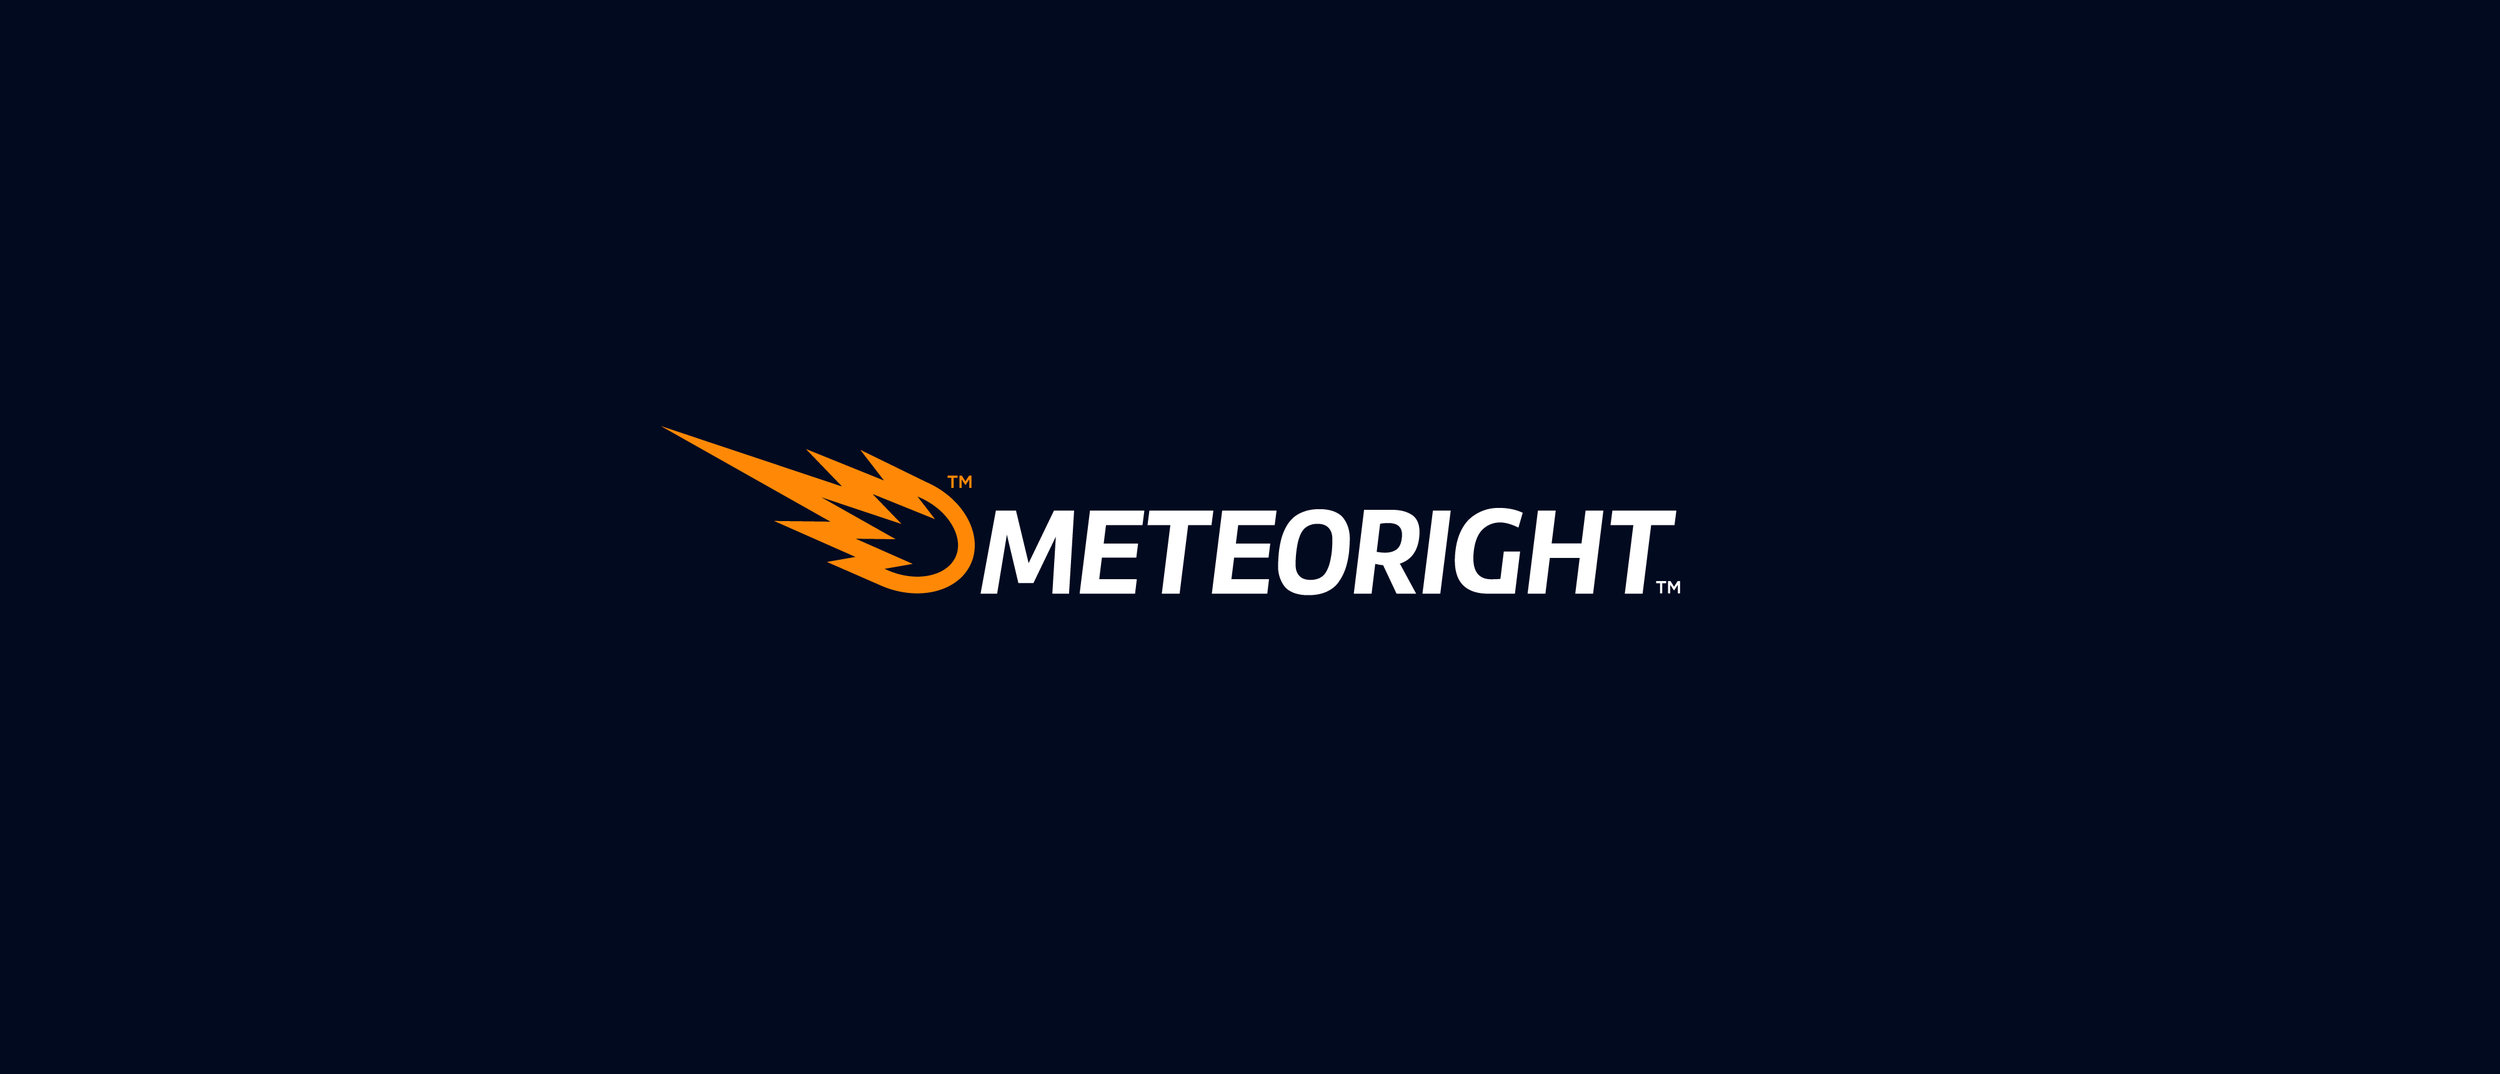 Meteoright | Holding Company | 2018